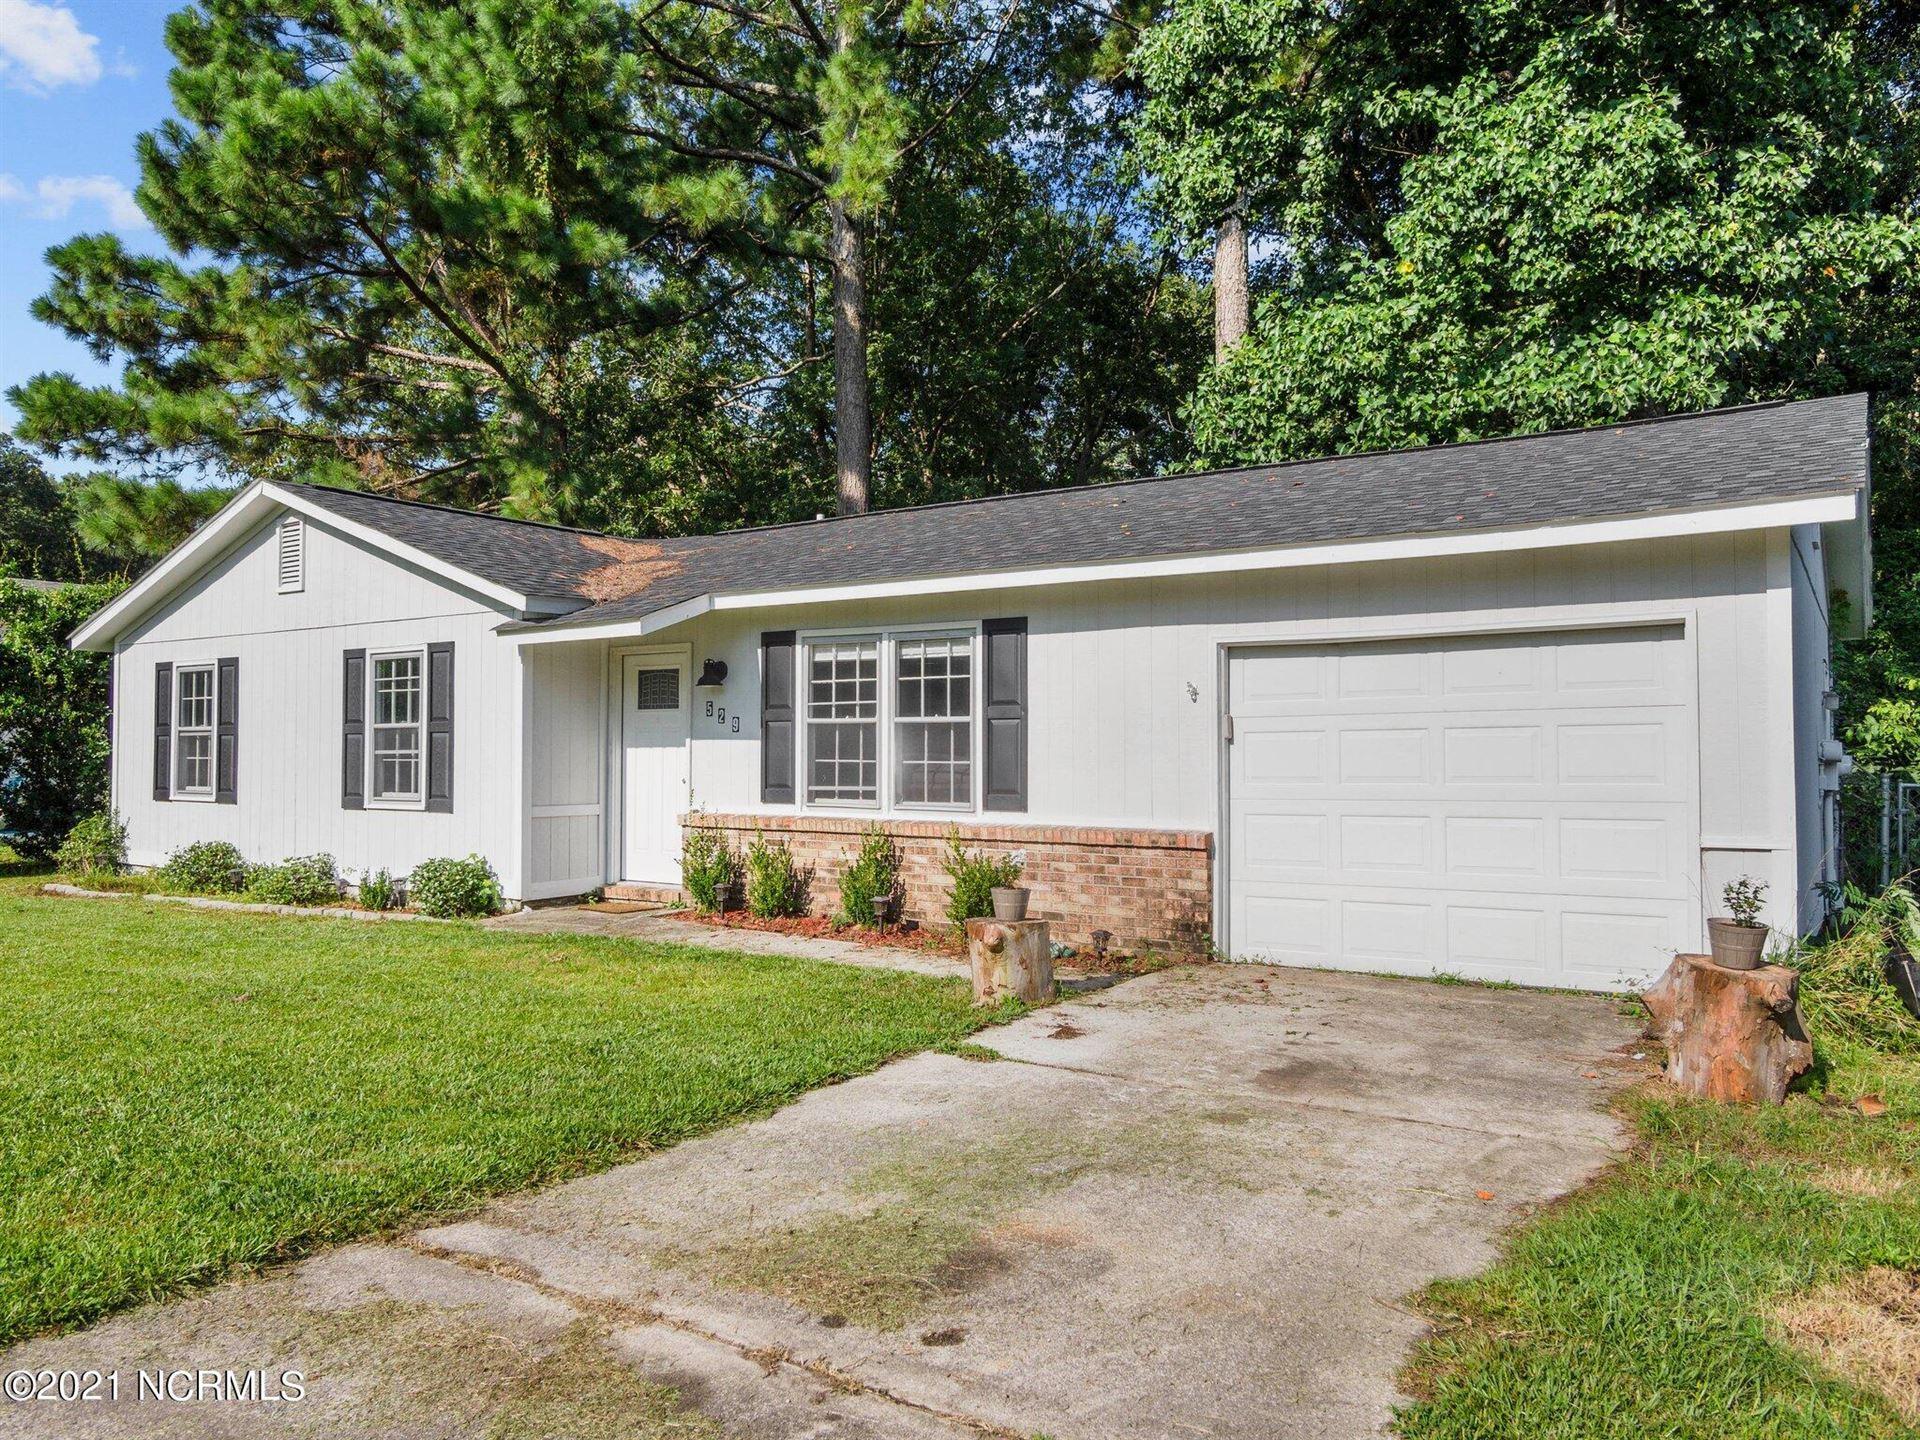 Photo of 529 Oci Drive, Jacksonville, NC 28540 (MLS # 100285618)